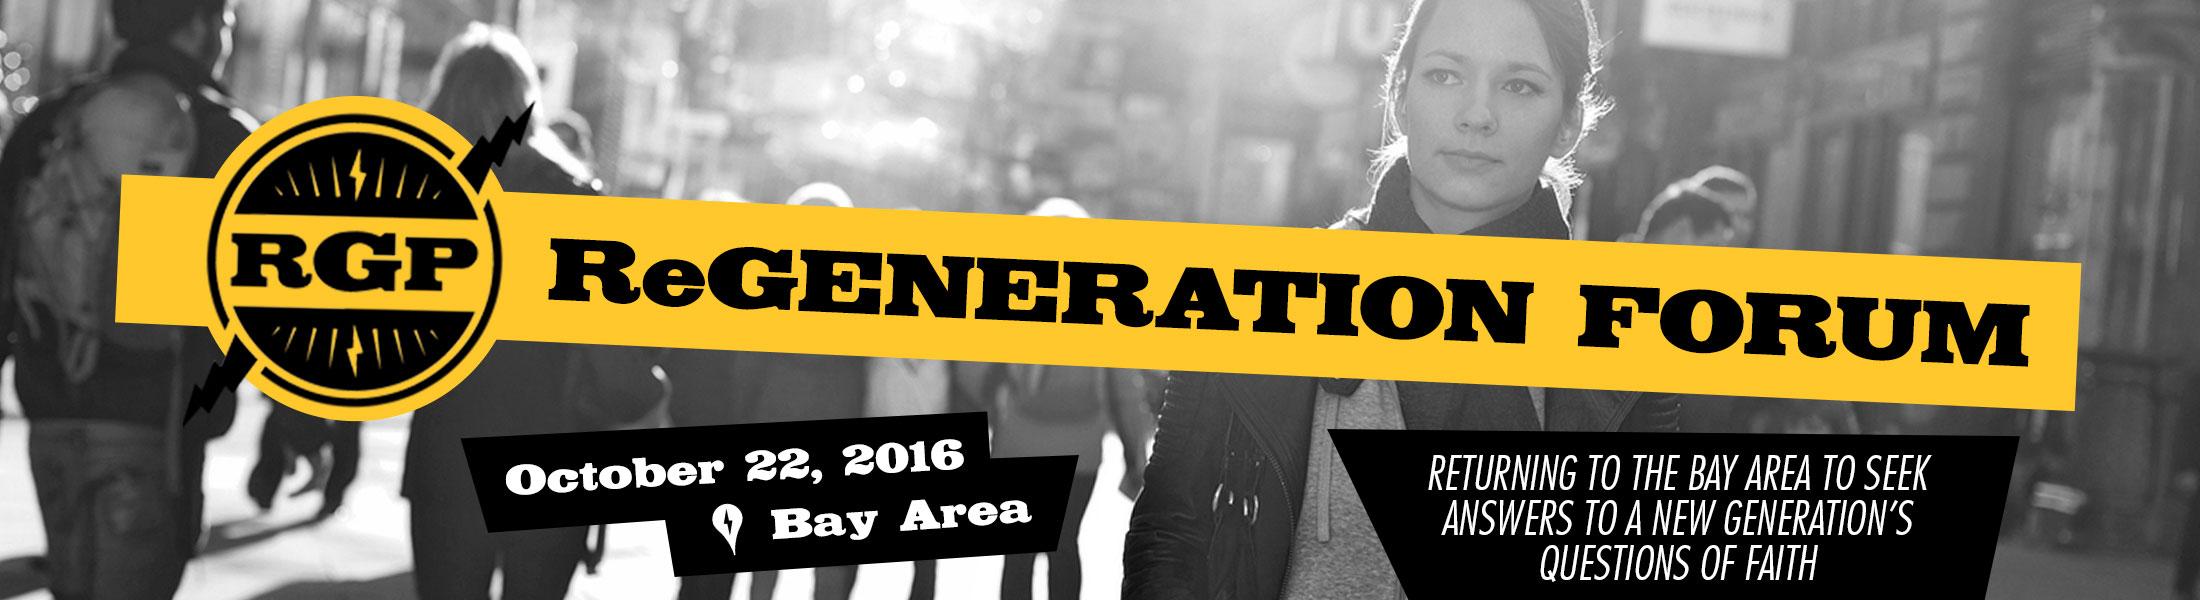 ReGeneration Forum 2016 - San Jose